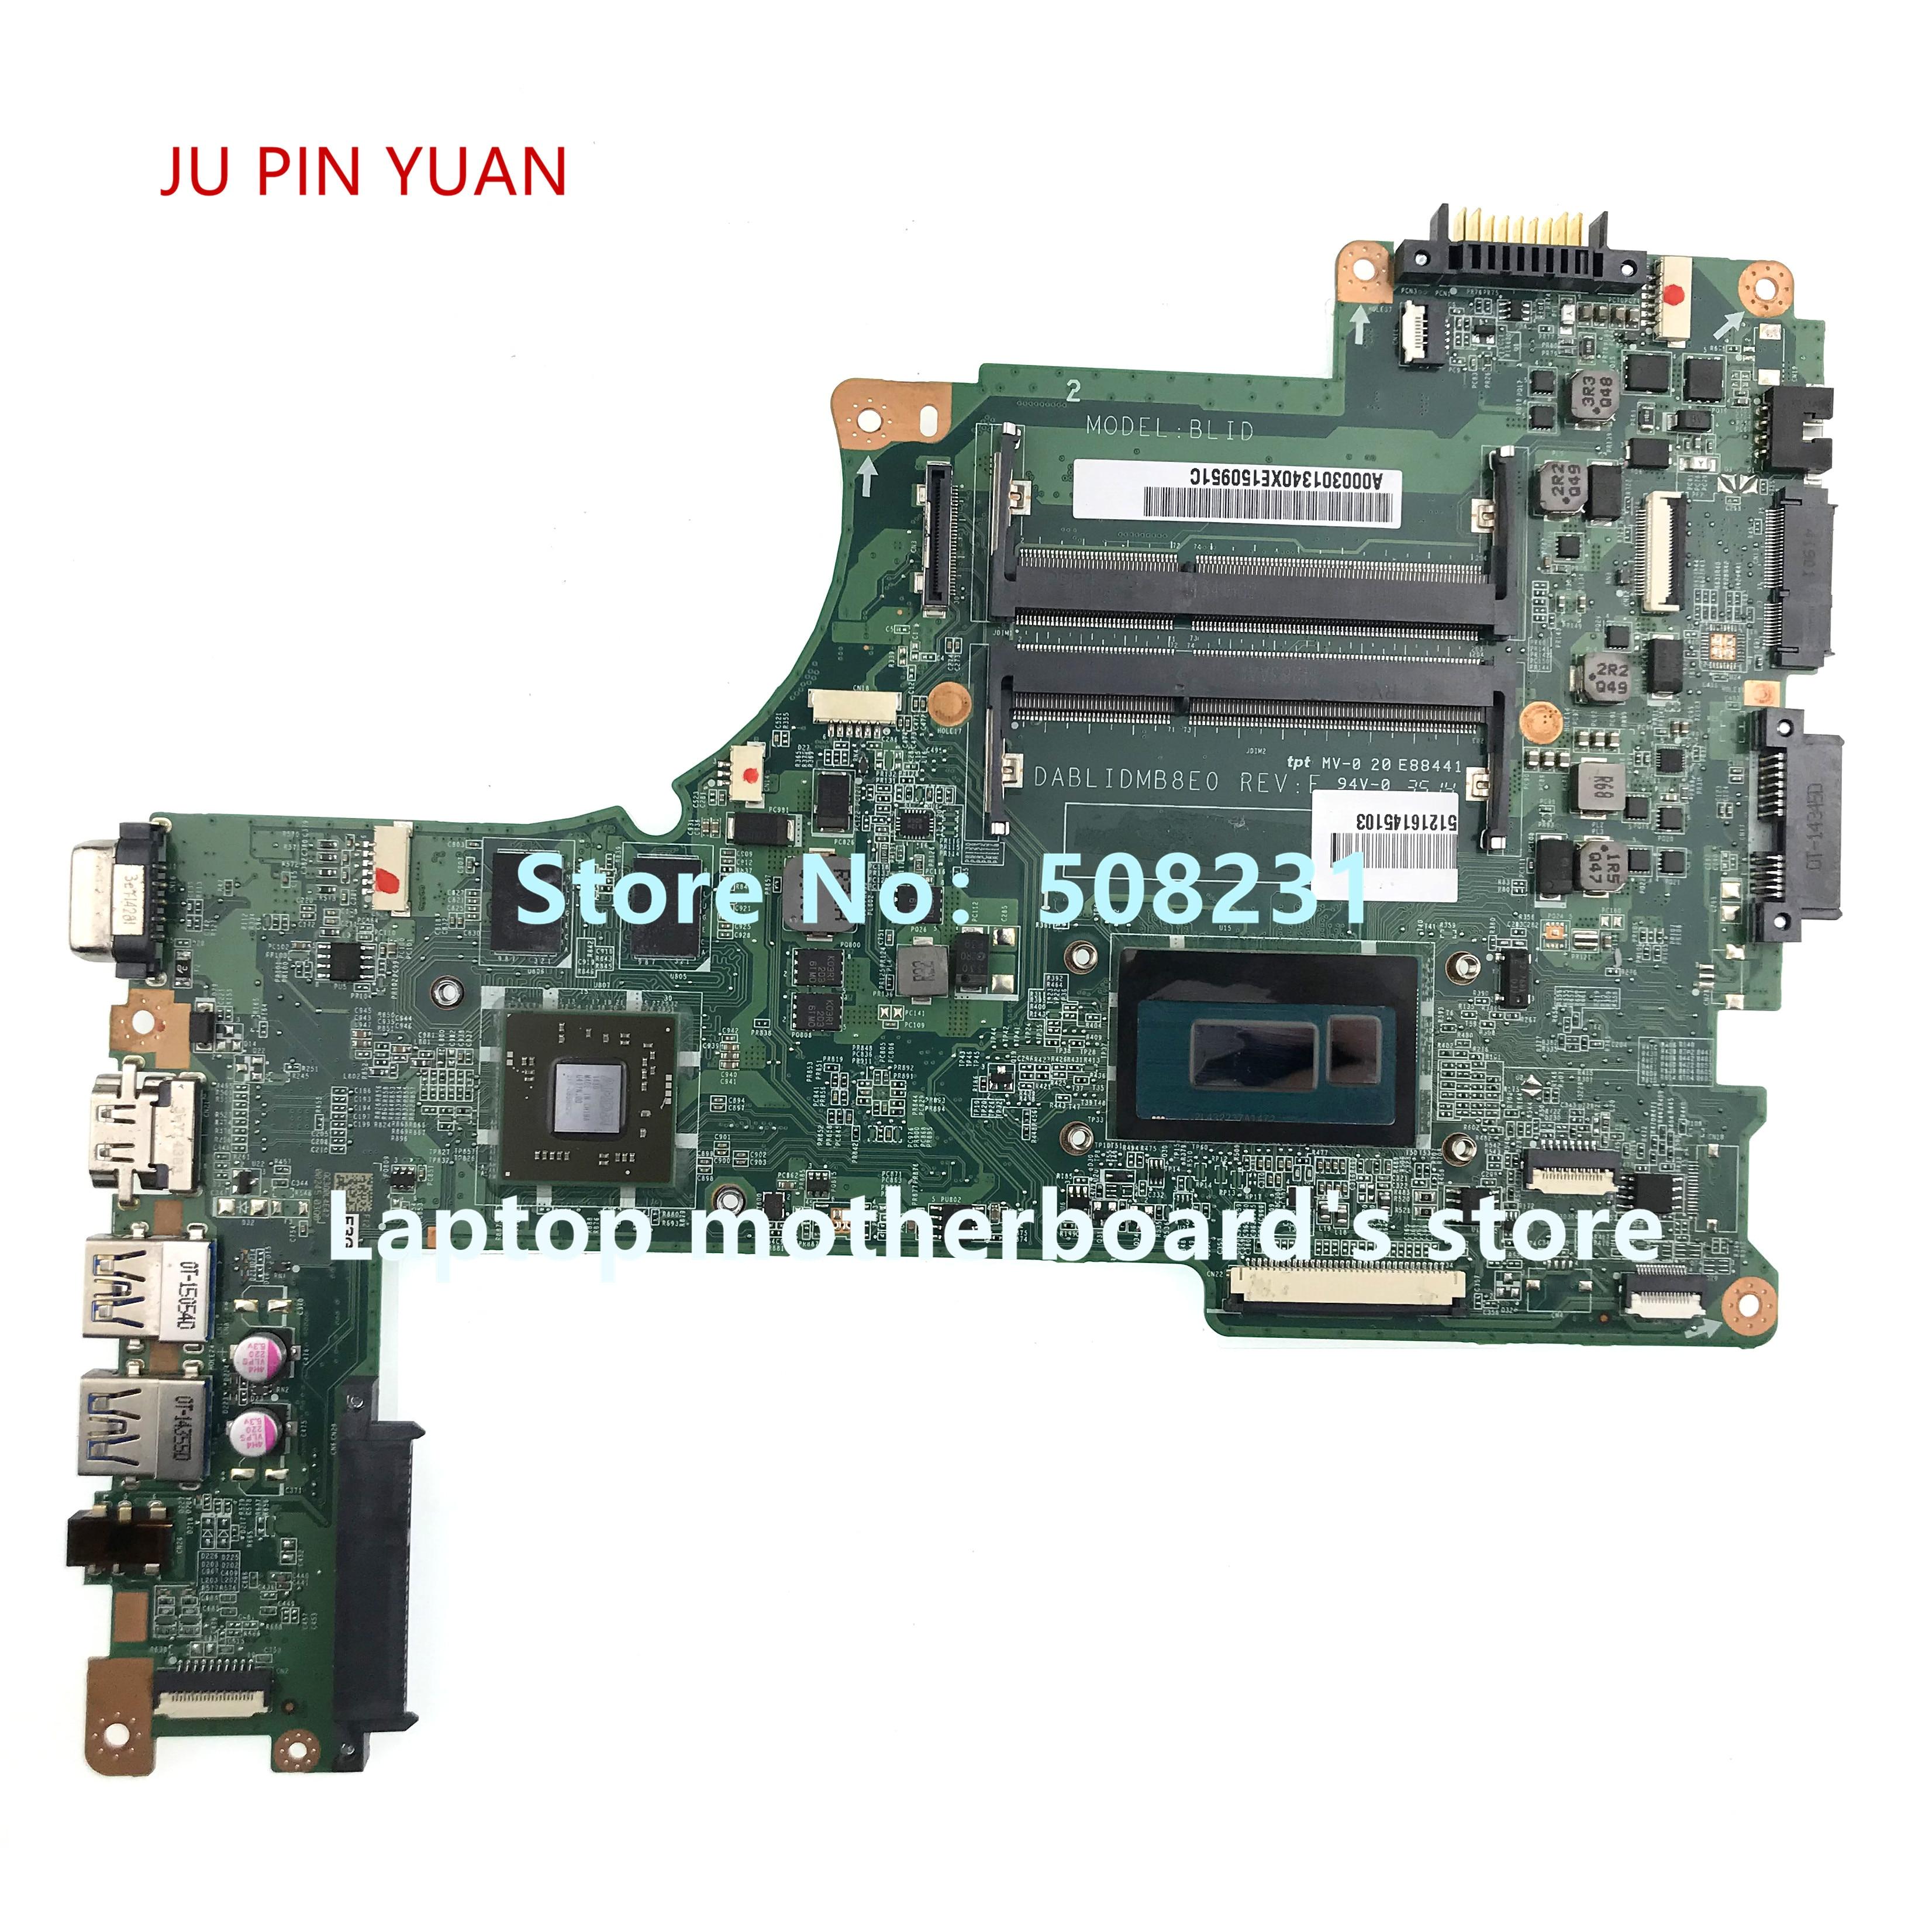 لتوشيبا L50-B L50-B L55-B اللوحة المحمول A000301340 DABLIDMB8E0 مع i5-4210u CPU 100% اختبار بالكامل